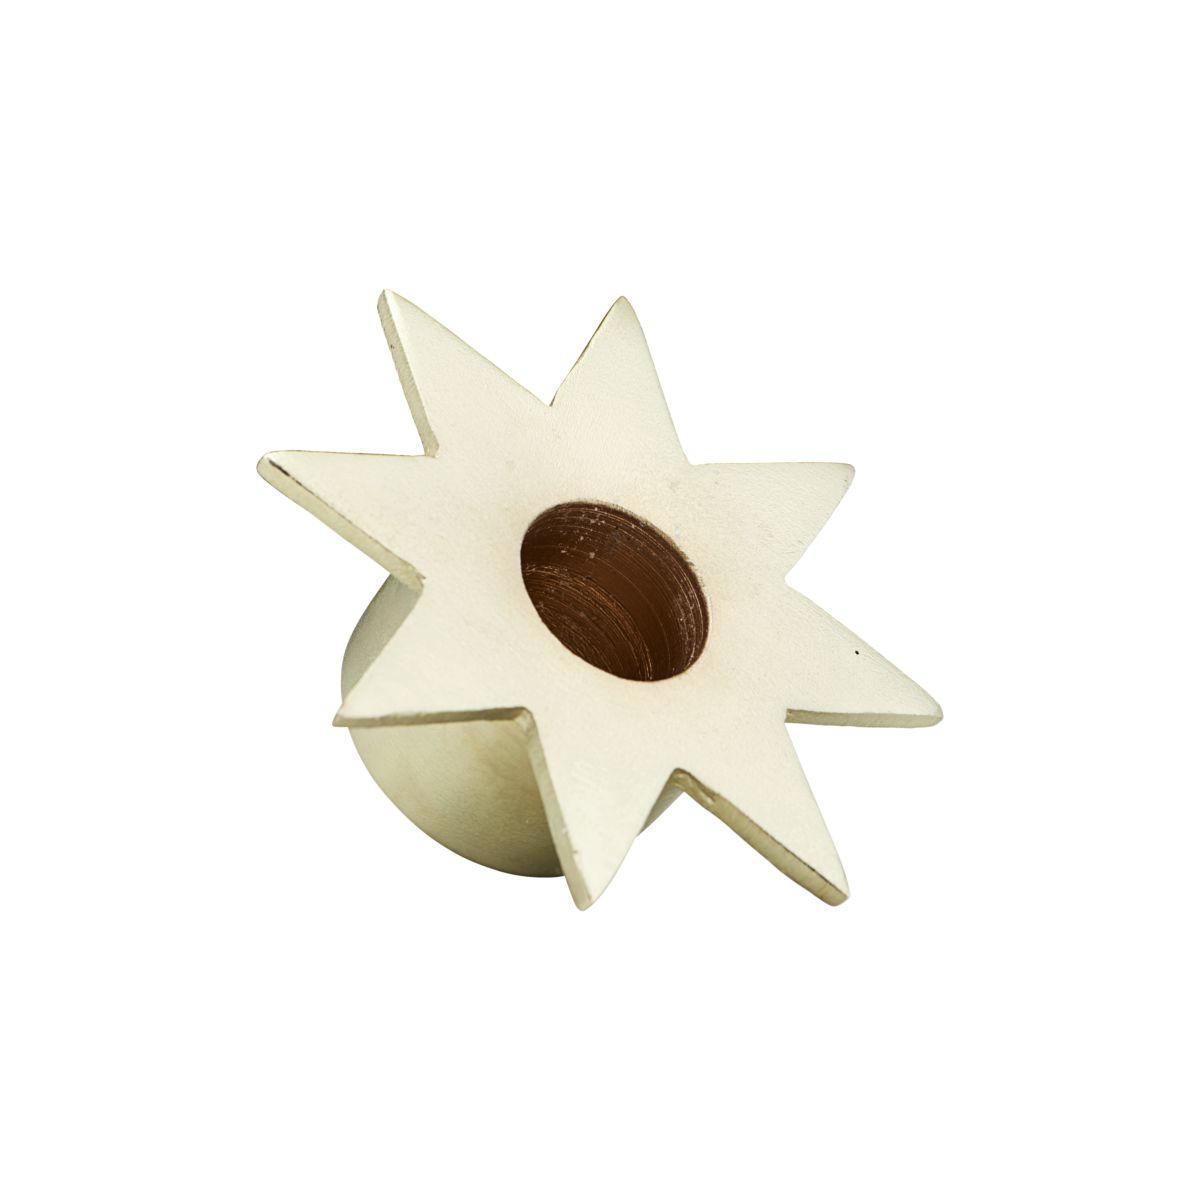 House Doctor Kovový zlatý svícen Star, zlatá barva, kov